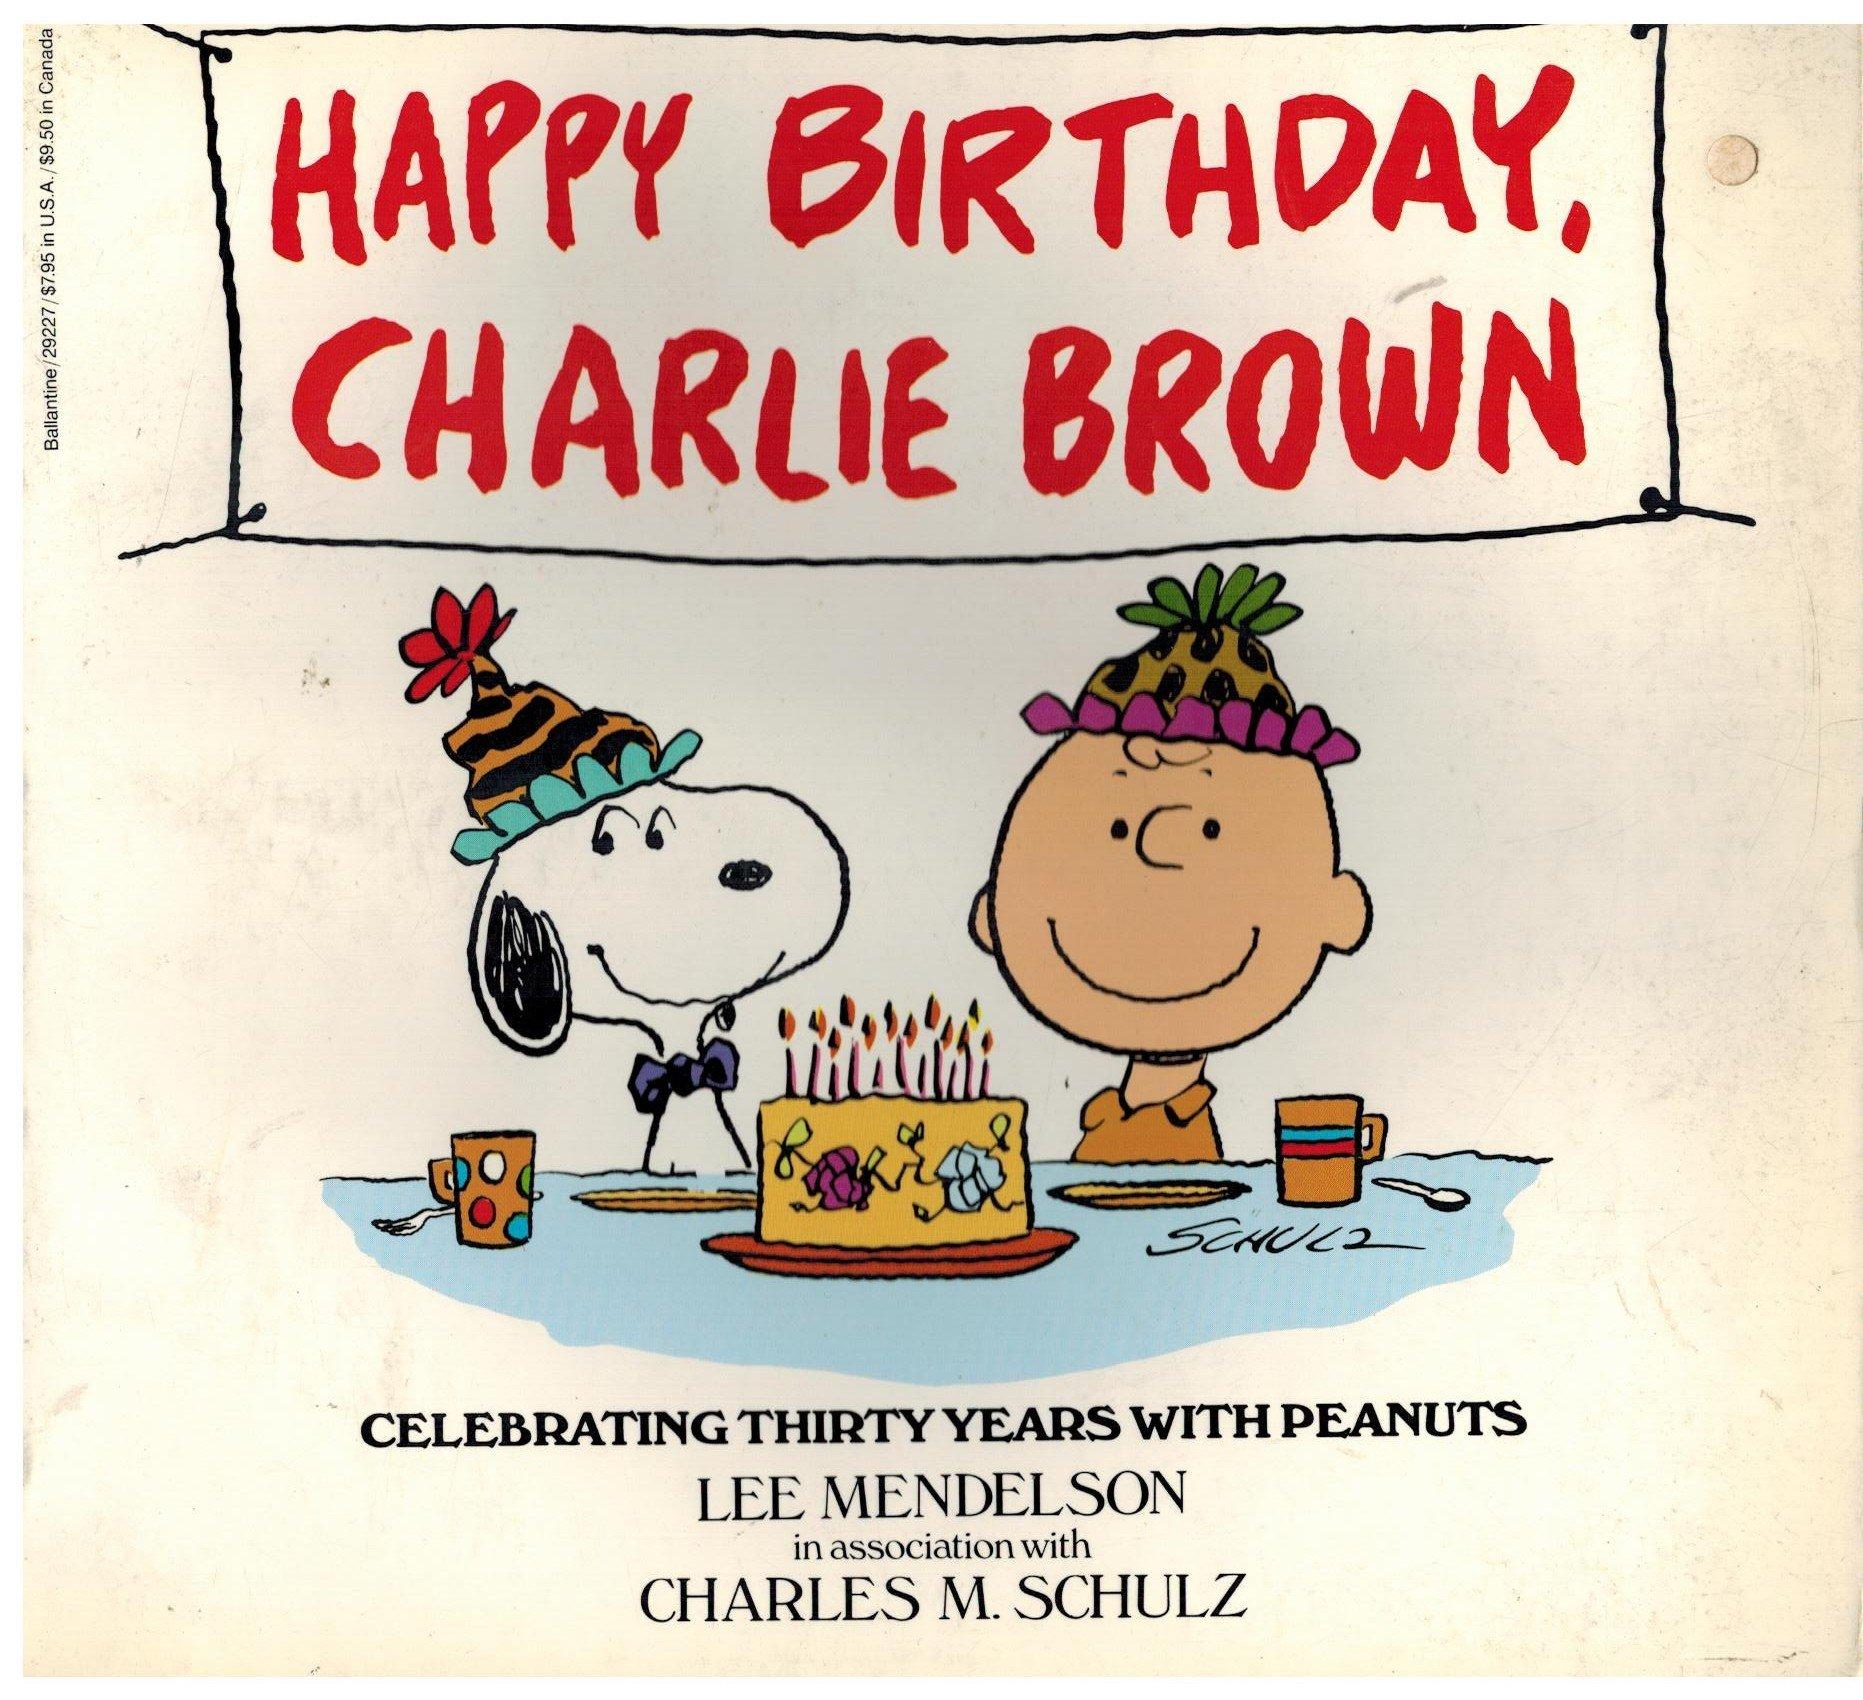 charlie brown birthday Happy Birthday, Charlie Brown: Charles M. Schulz: 9780345292278  charlie brown birthday